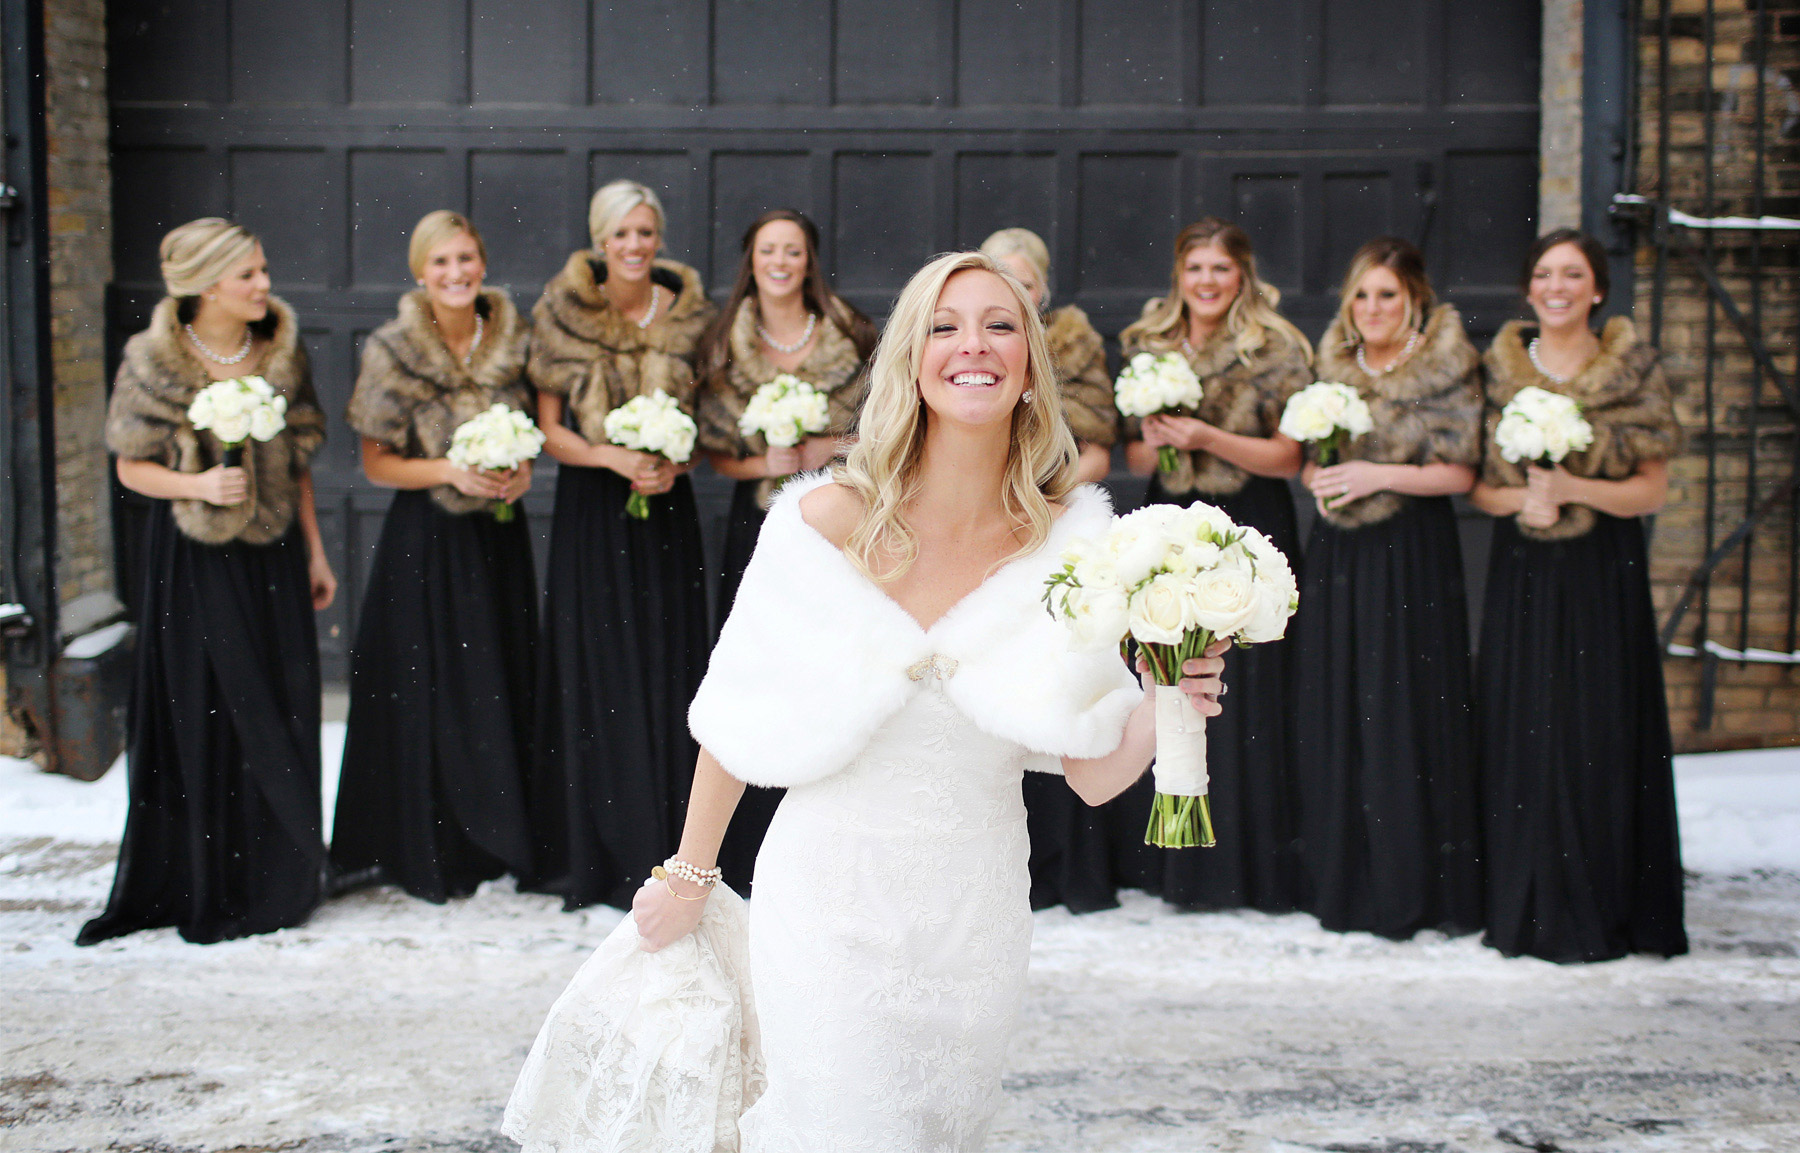 08-Minneapolis-Minnesota-Wedding-Photography-by-Vick-Photography-Downtown-Bridesmaids-Winter-Shawl-Caroline-and-J.jpg